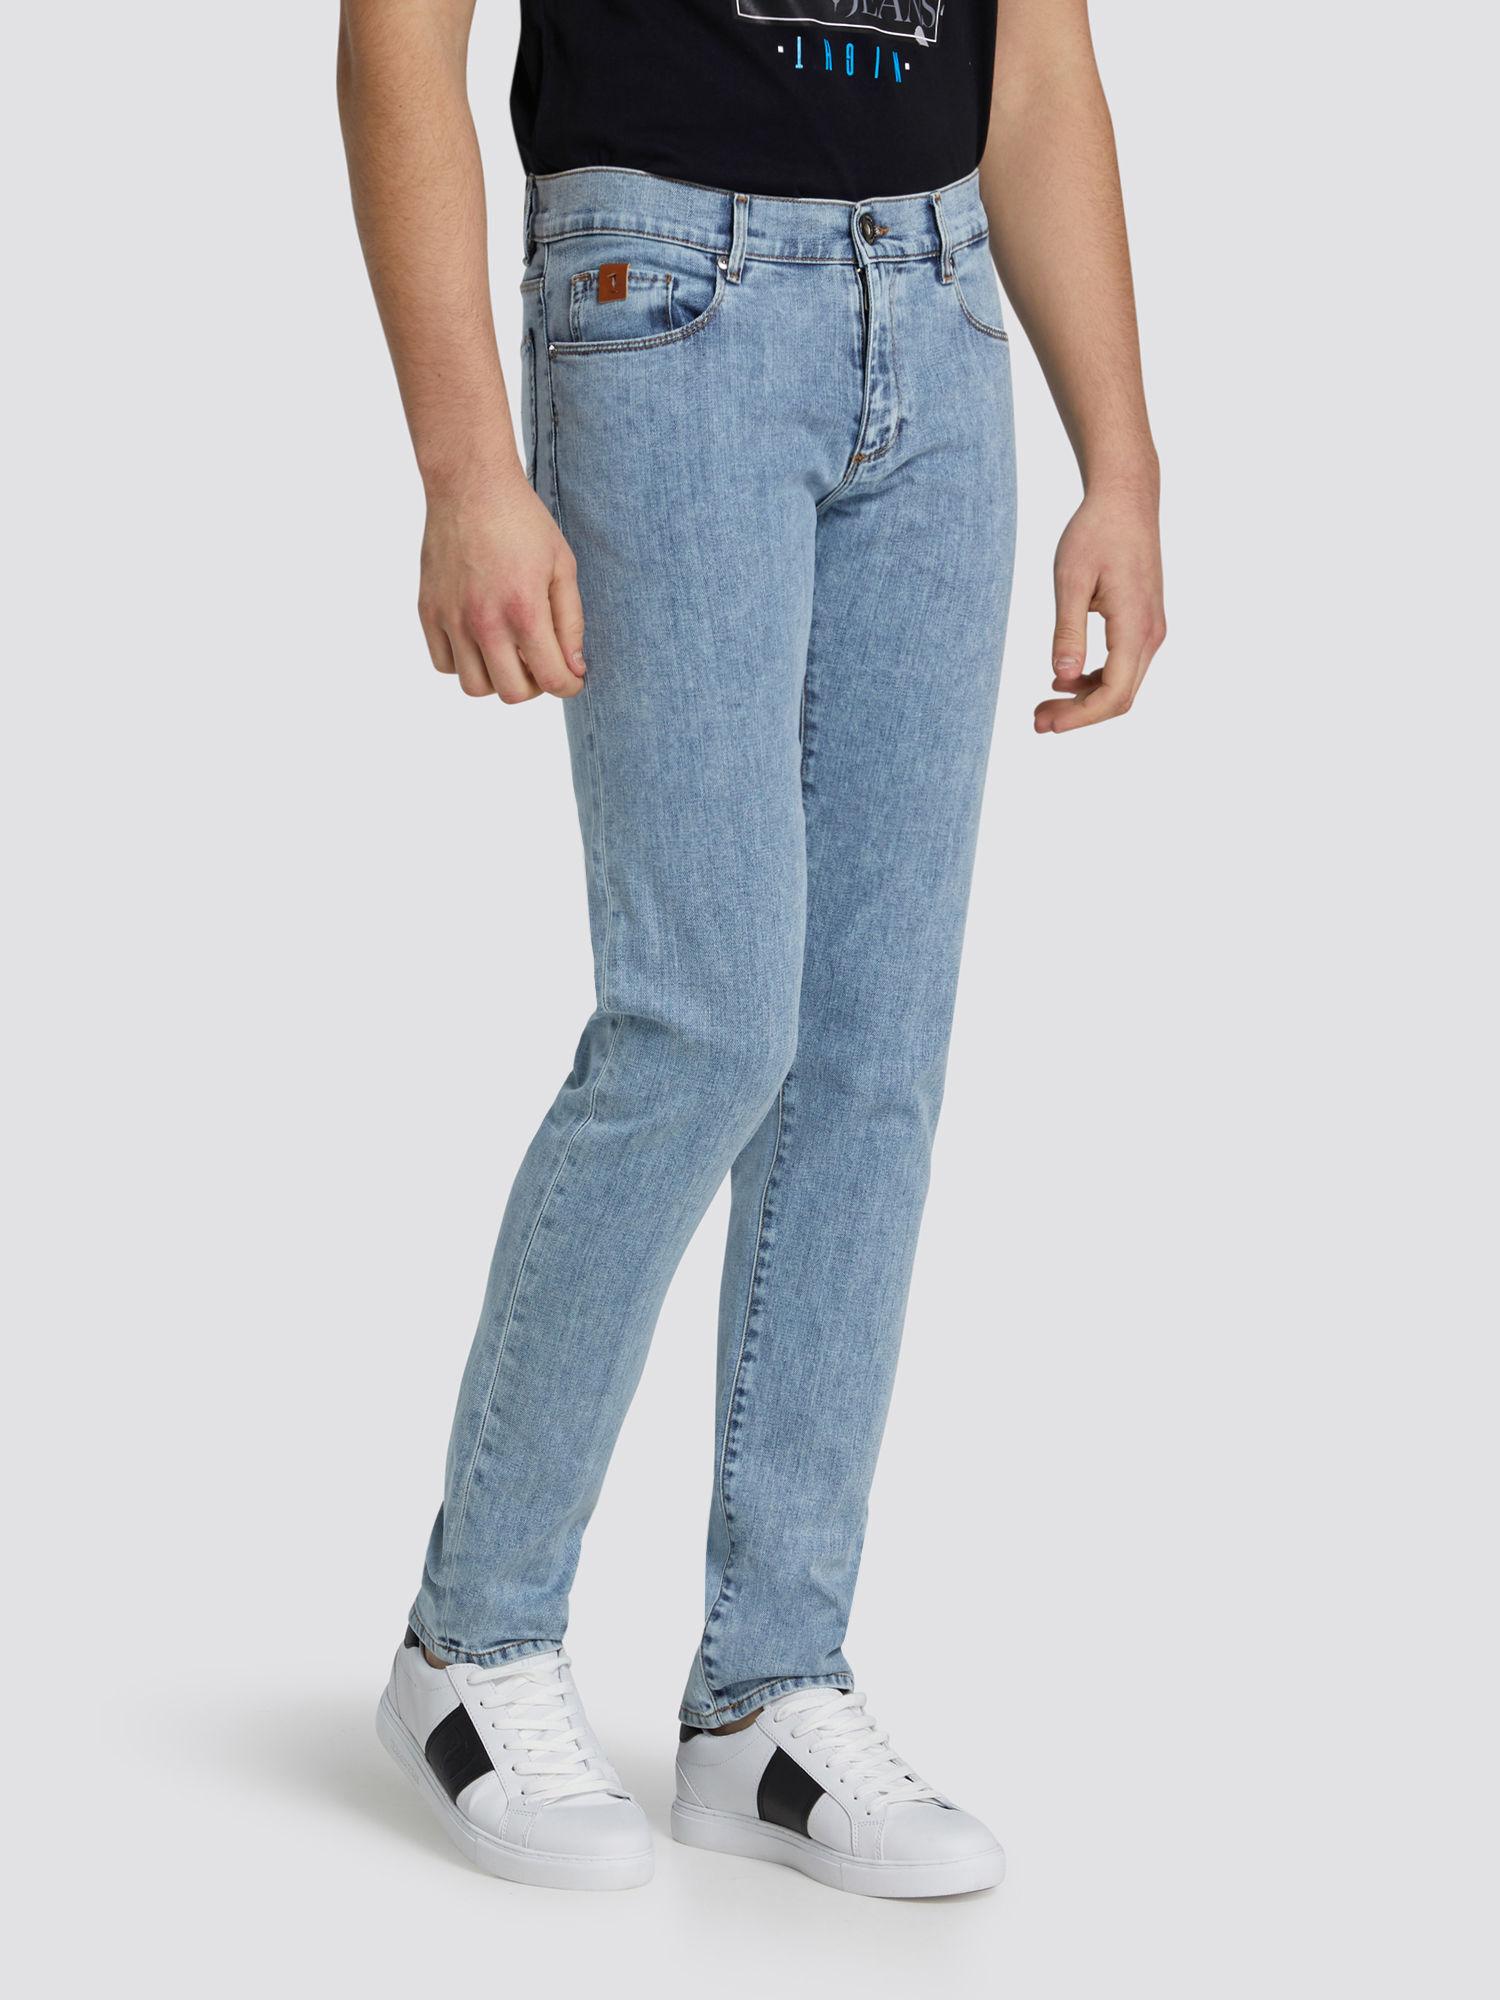 Slim Fit Jeans UomoTrussardi ® Da hsQrCxtd